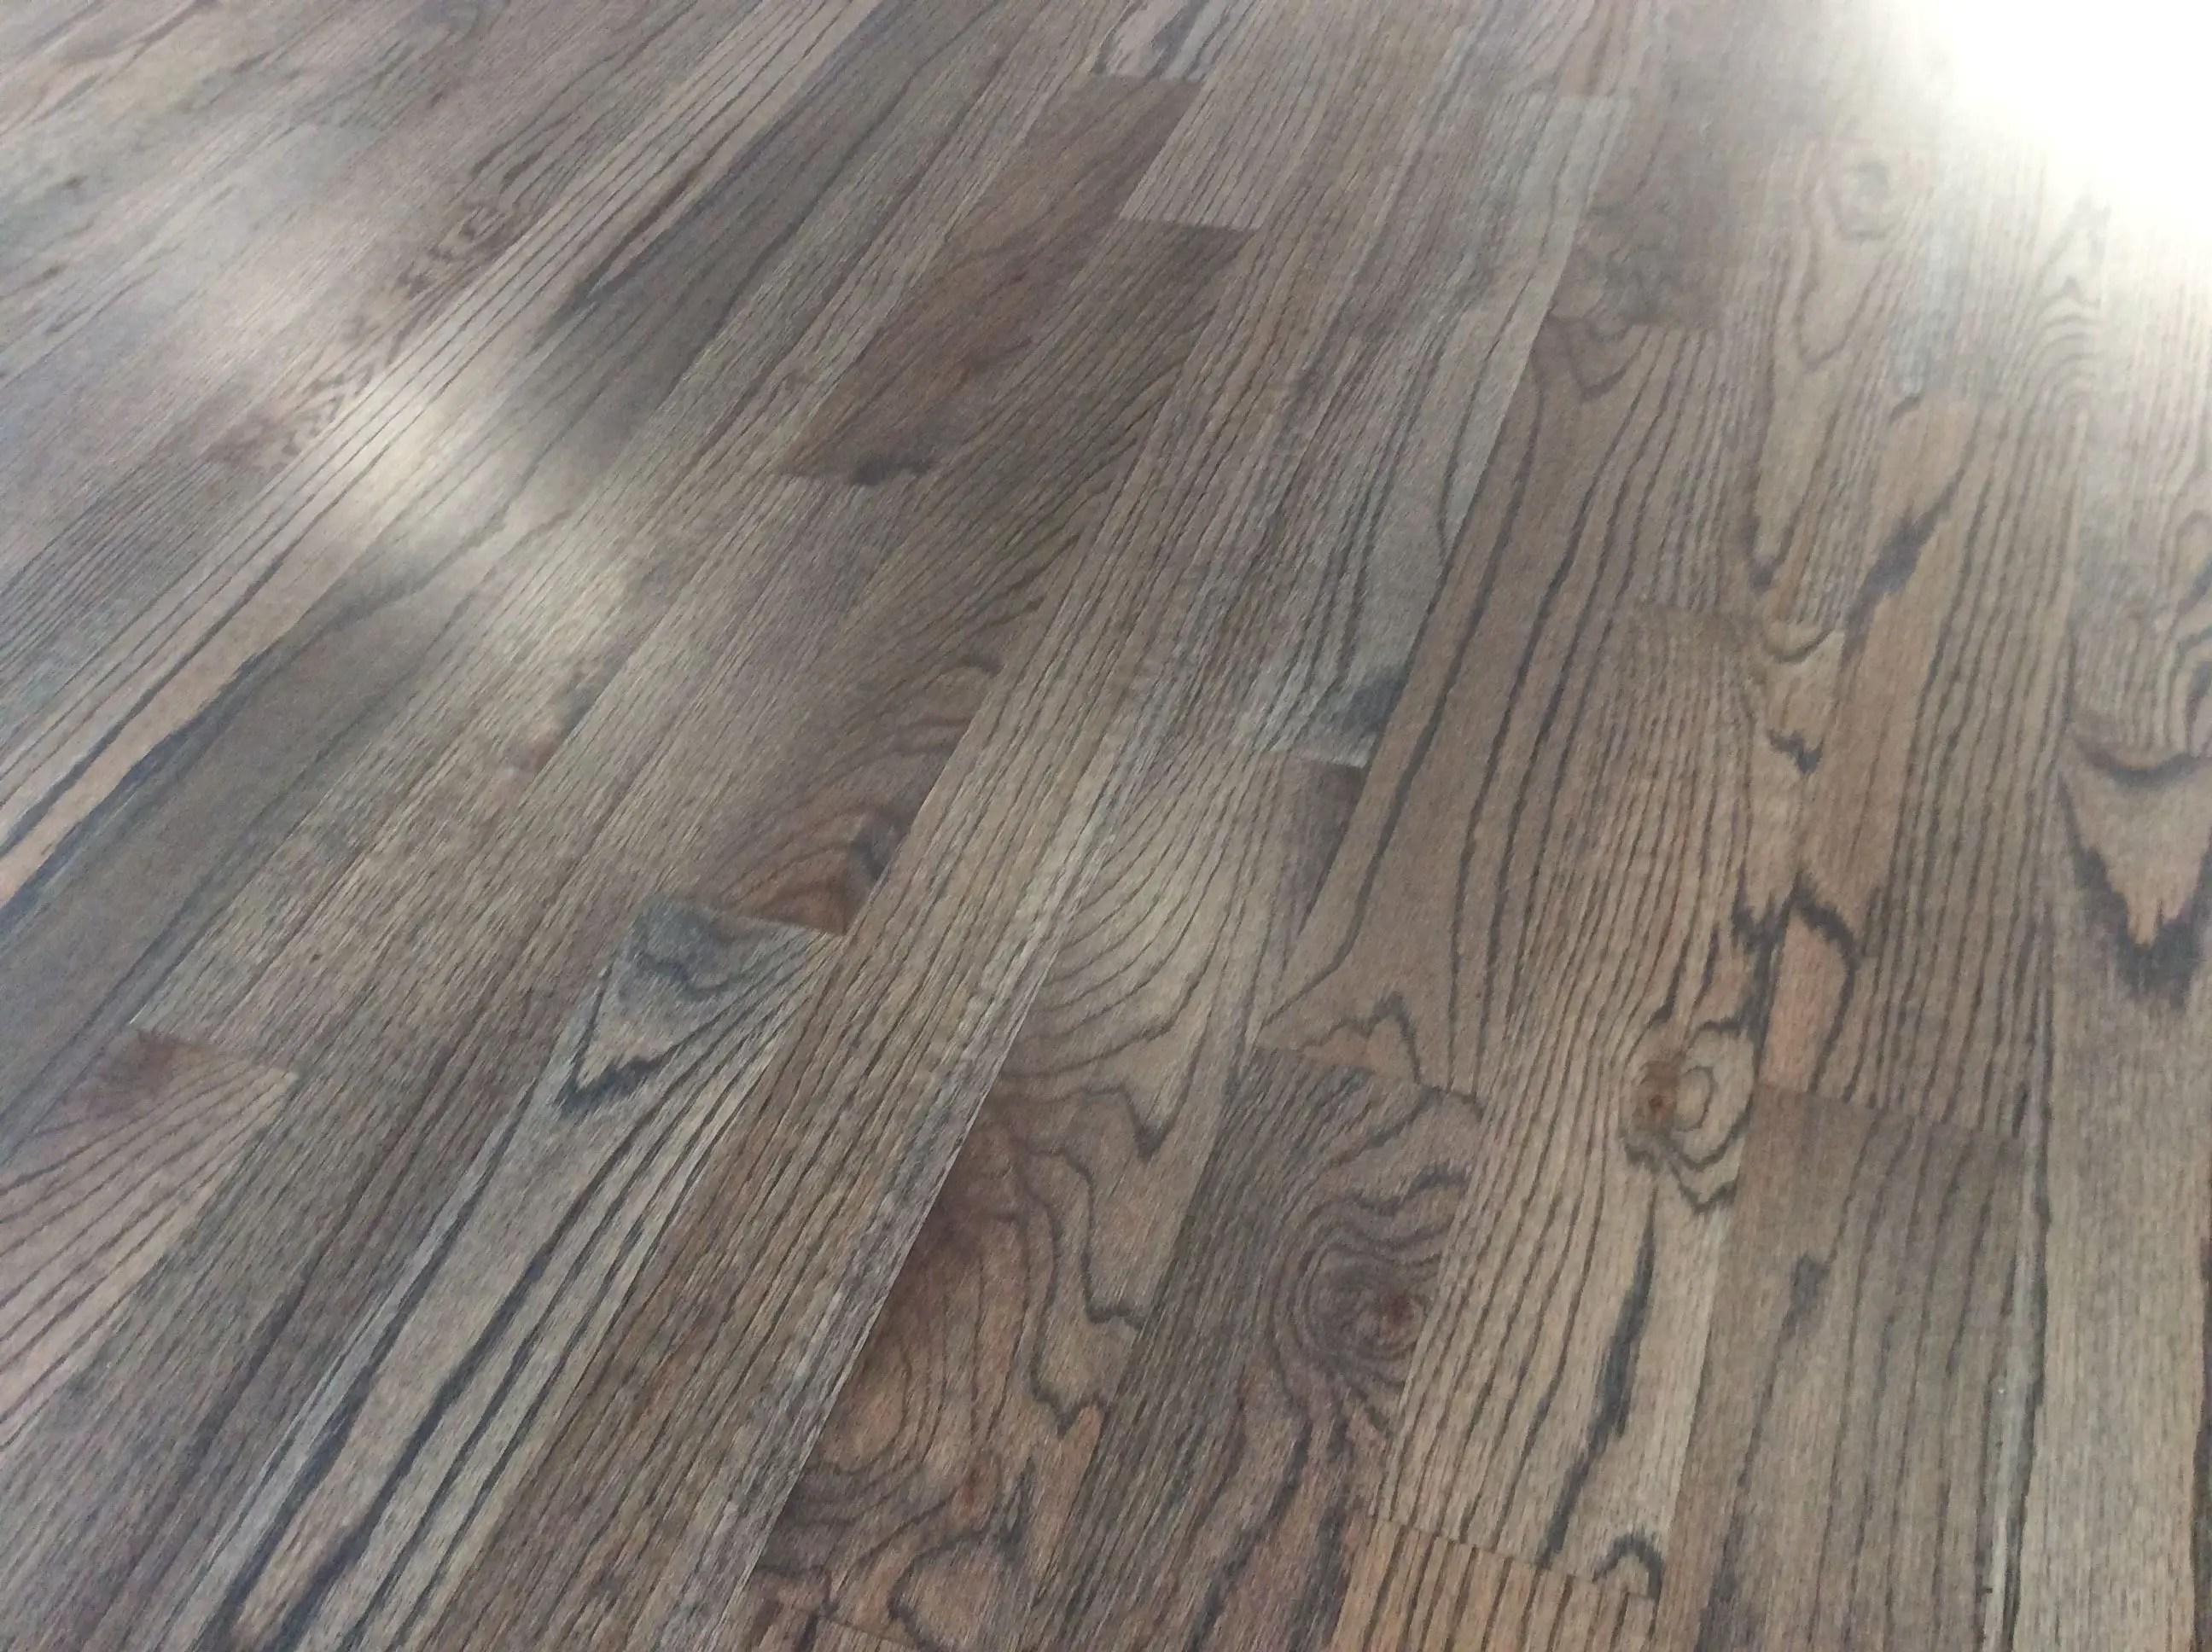 Nice Hardwood Floors Stain Colors Part - 12: Red Oak Floor Stain Colors 4